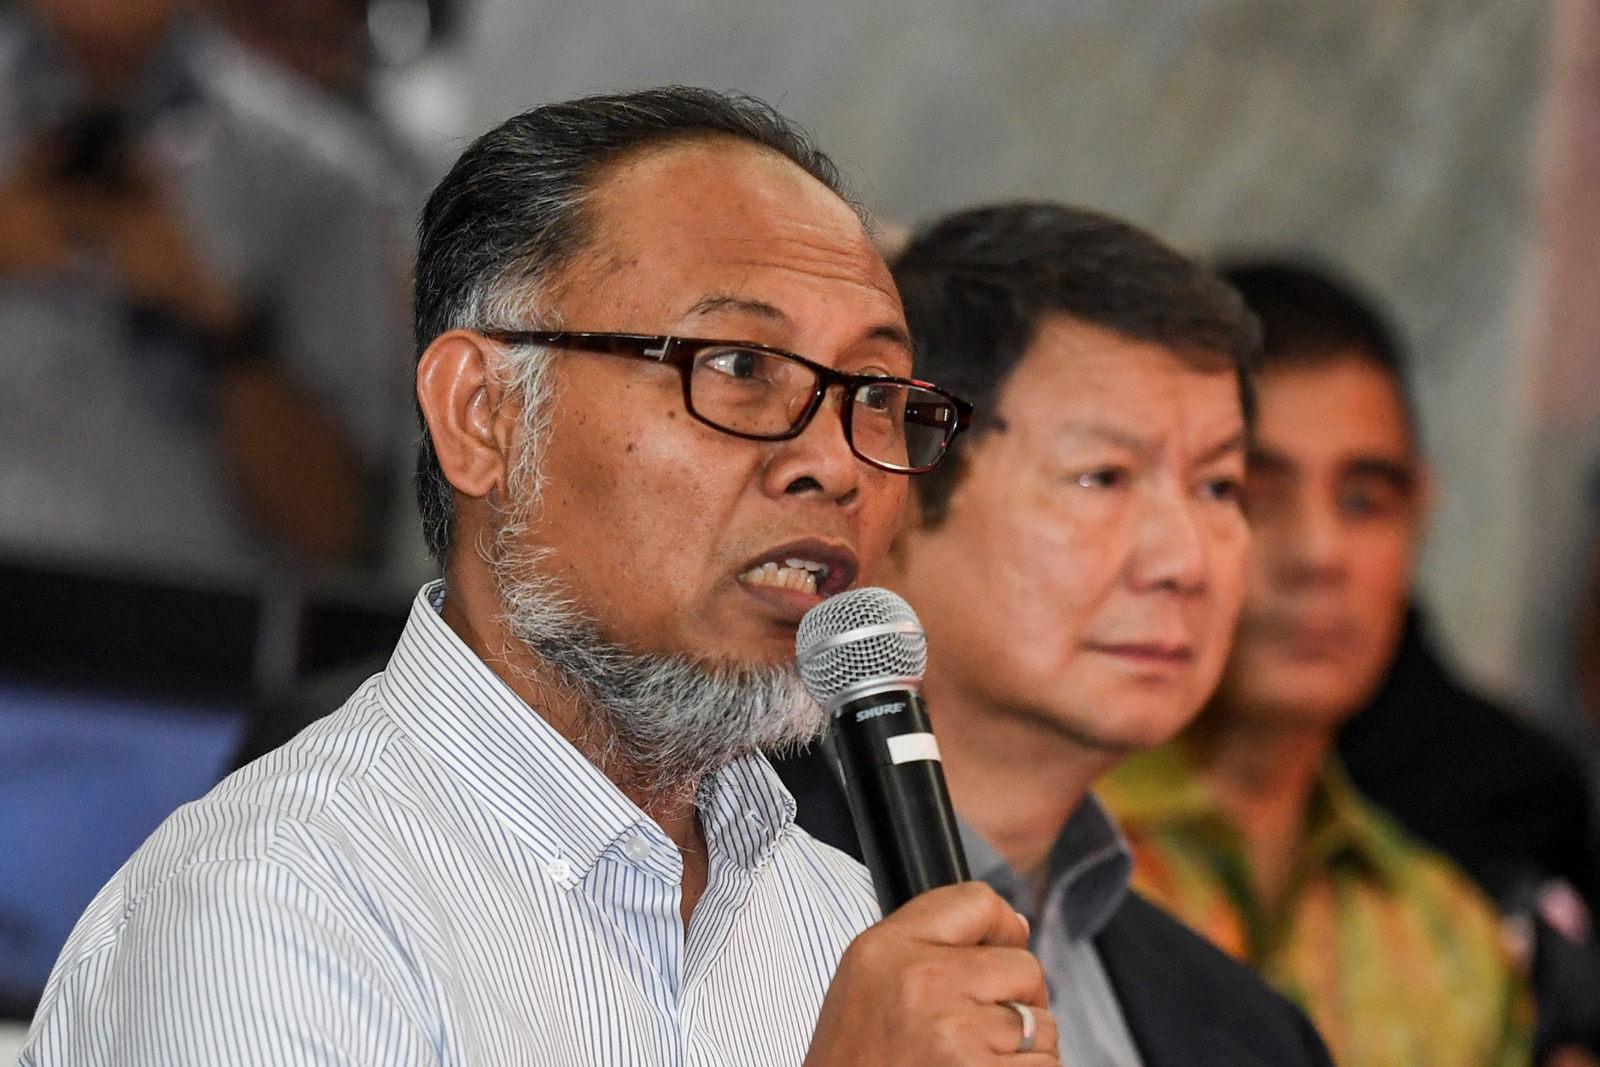 Kontroversi Bambang Widjojanto Jelang Sidang MK